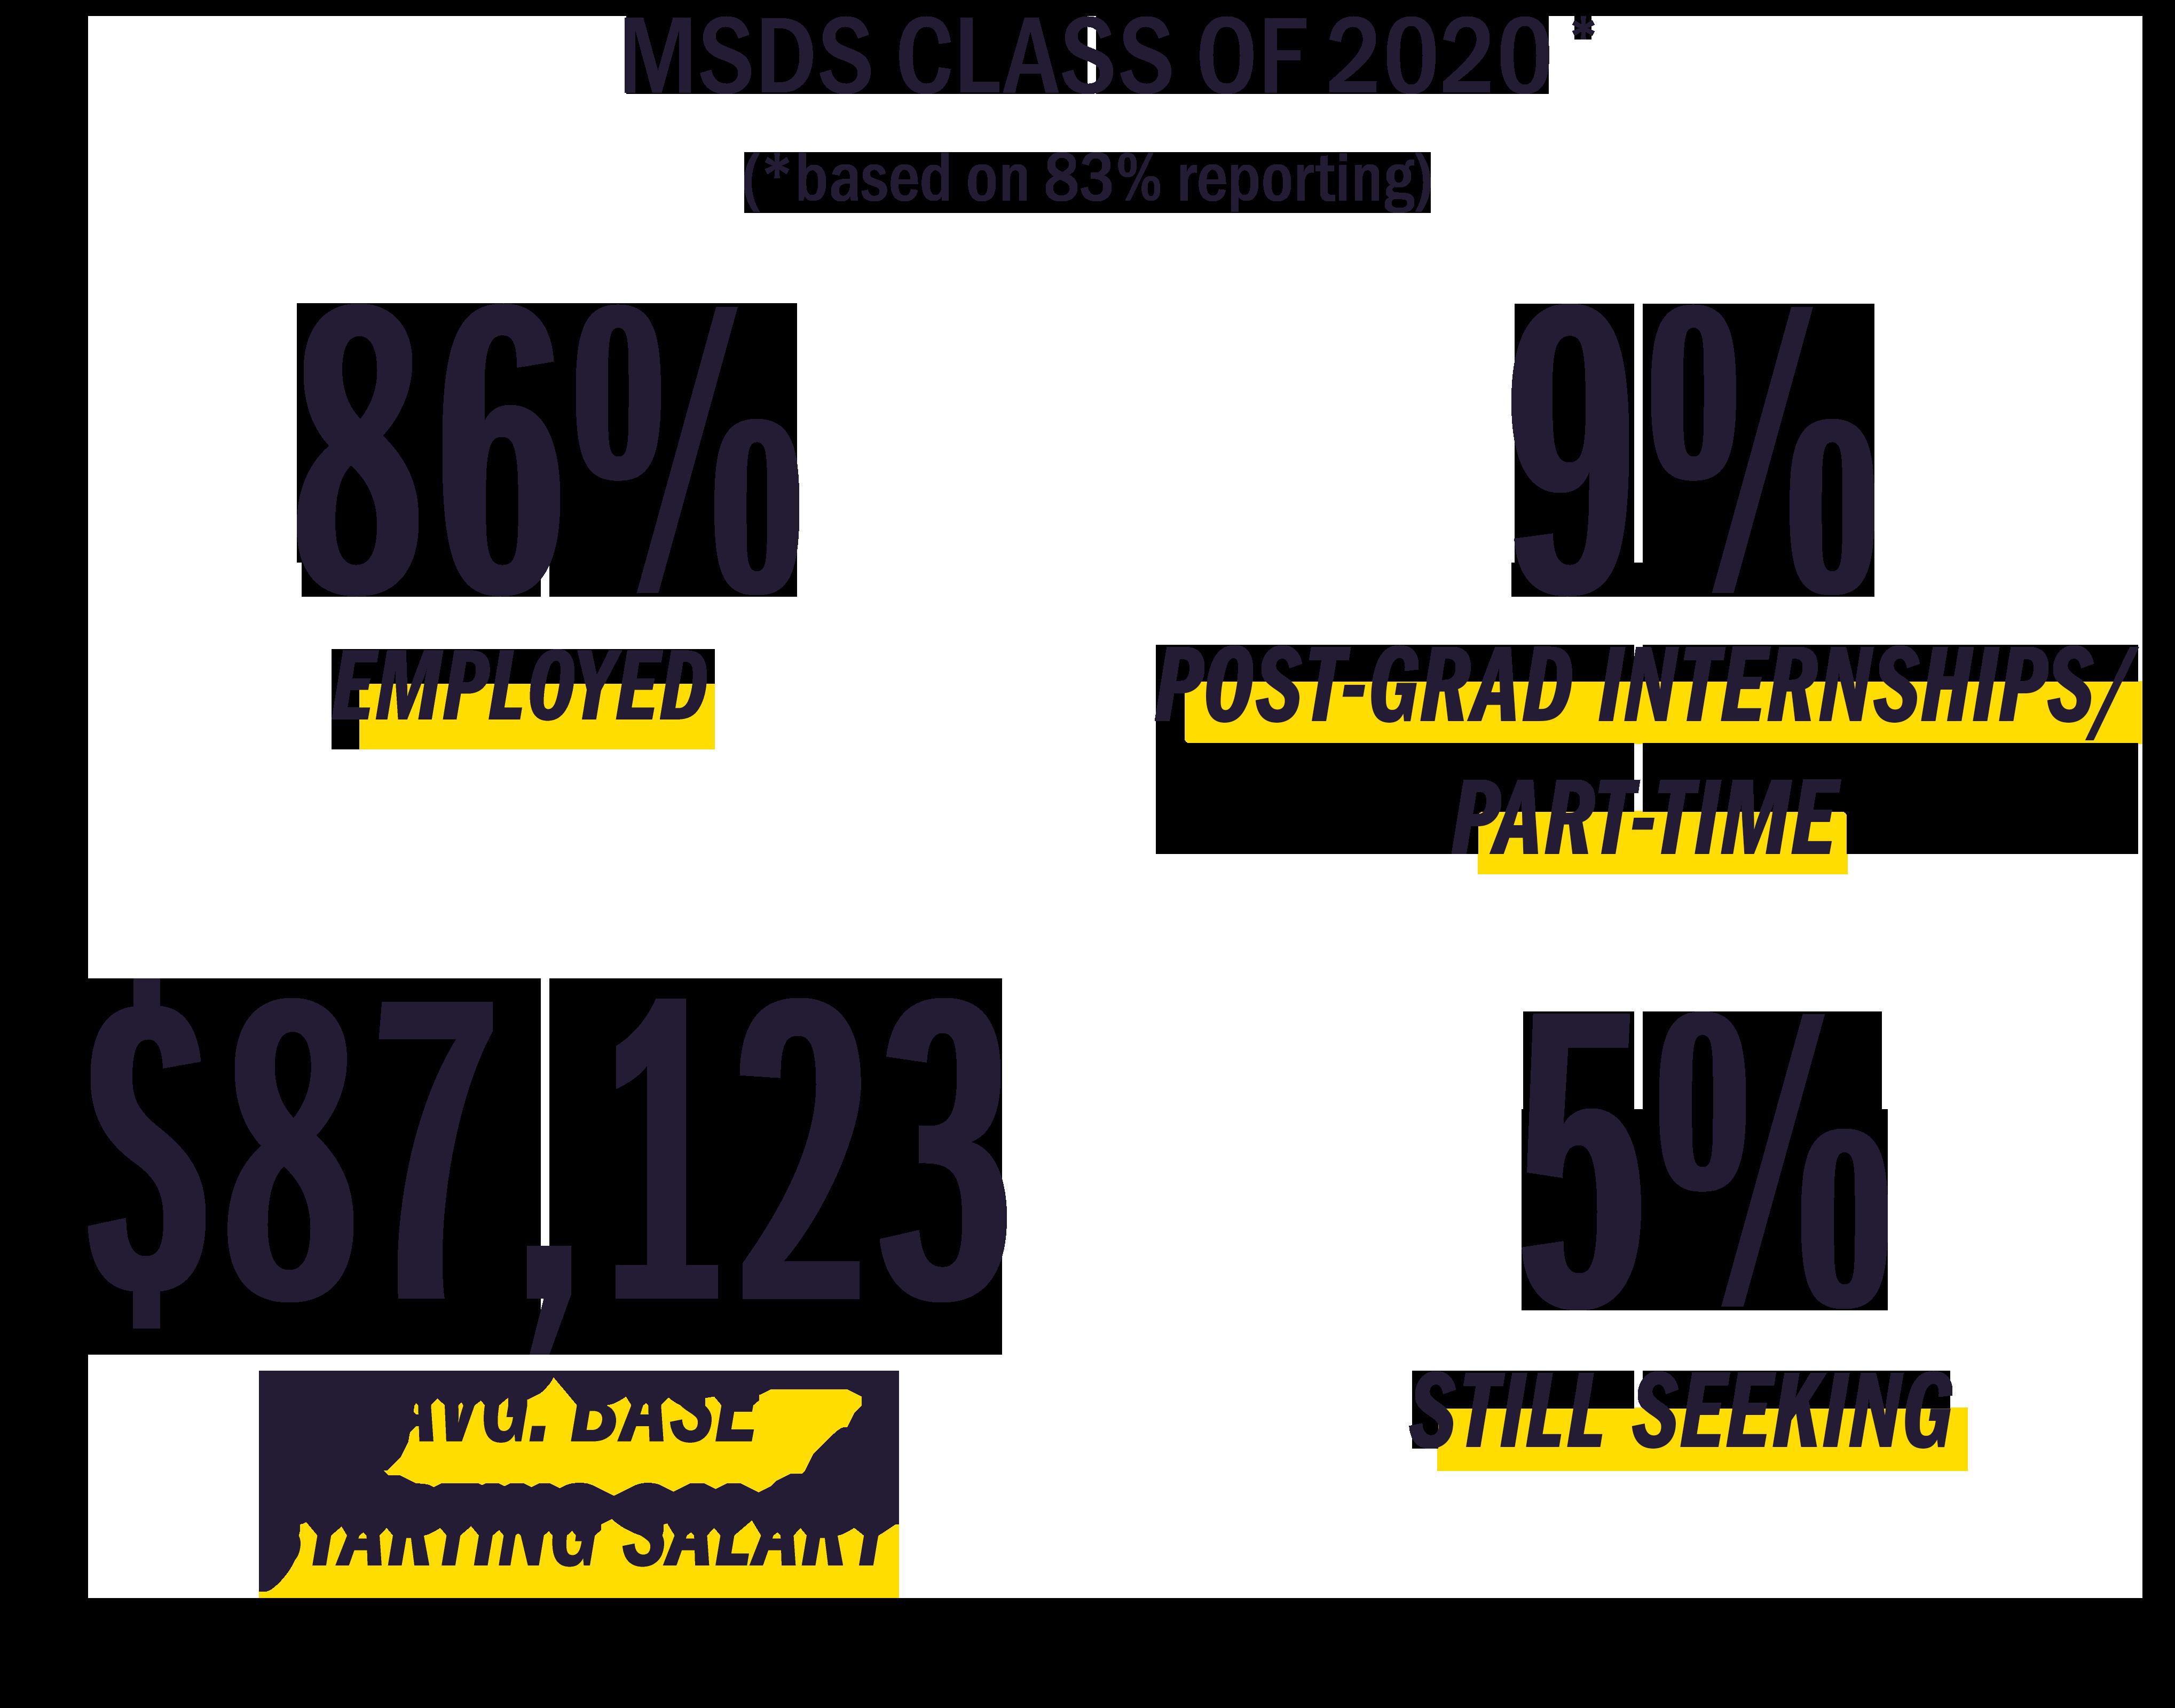 2020 Placement Statistics